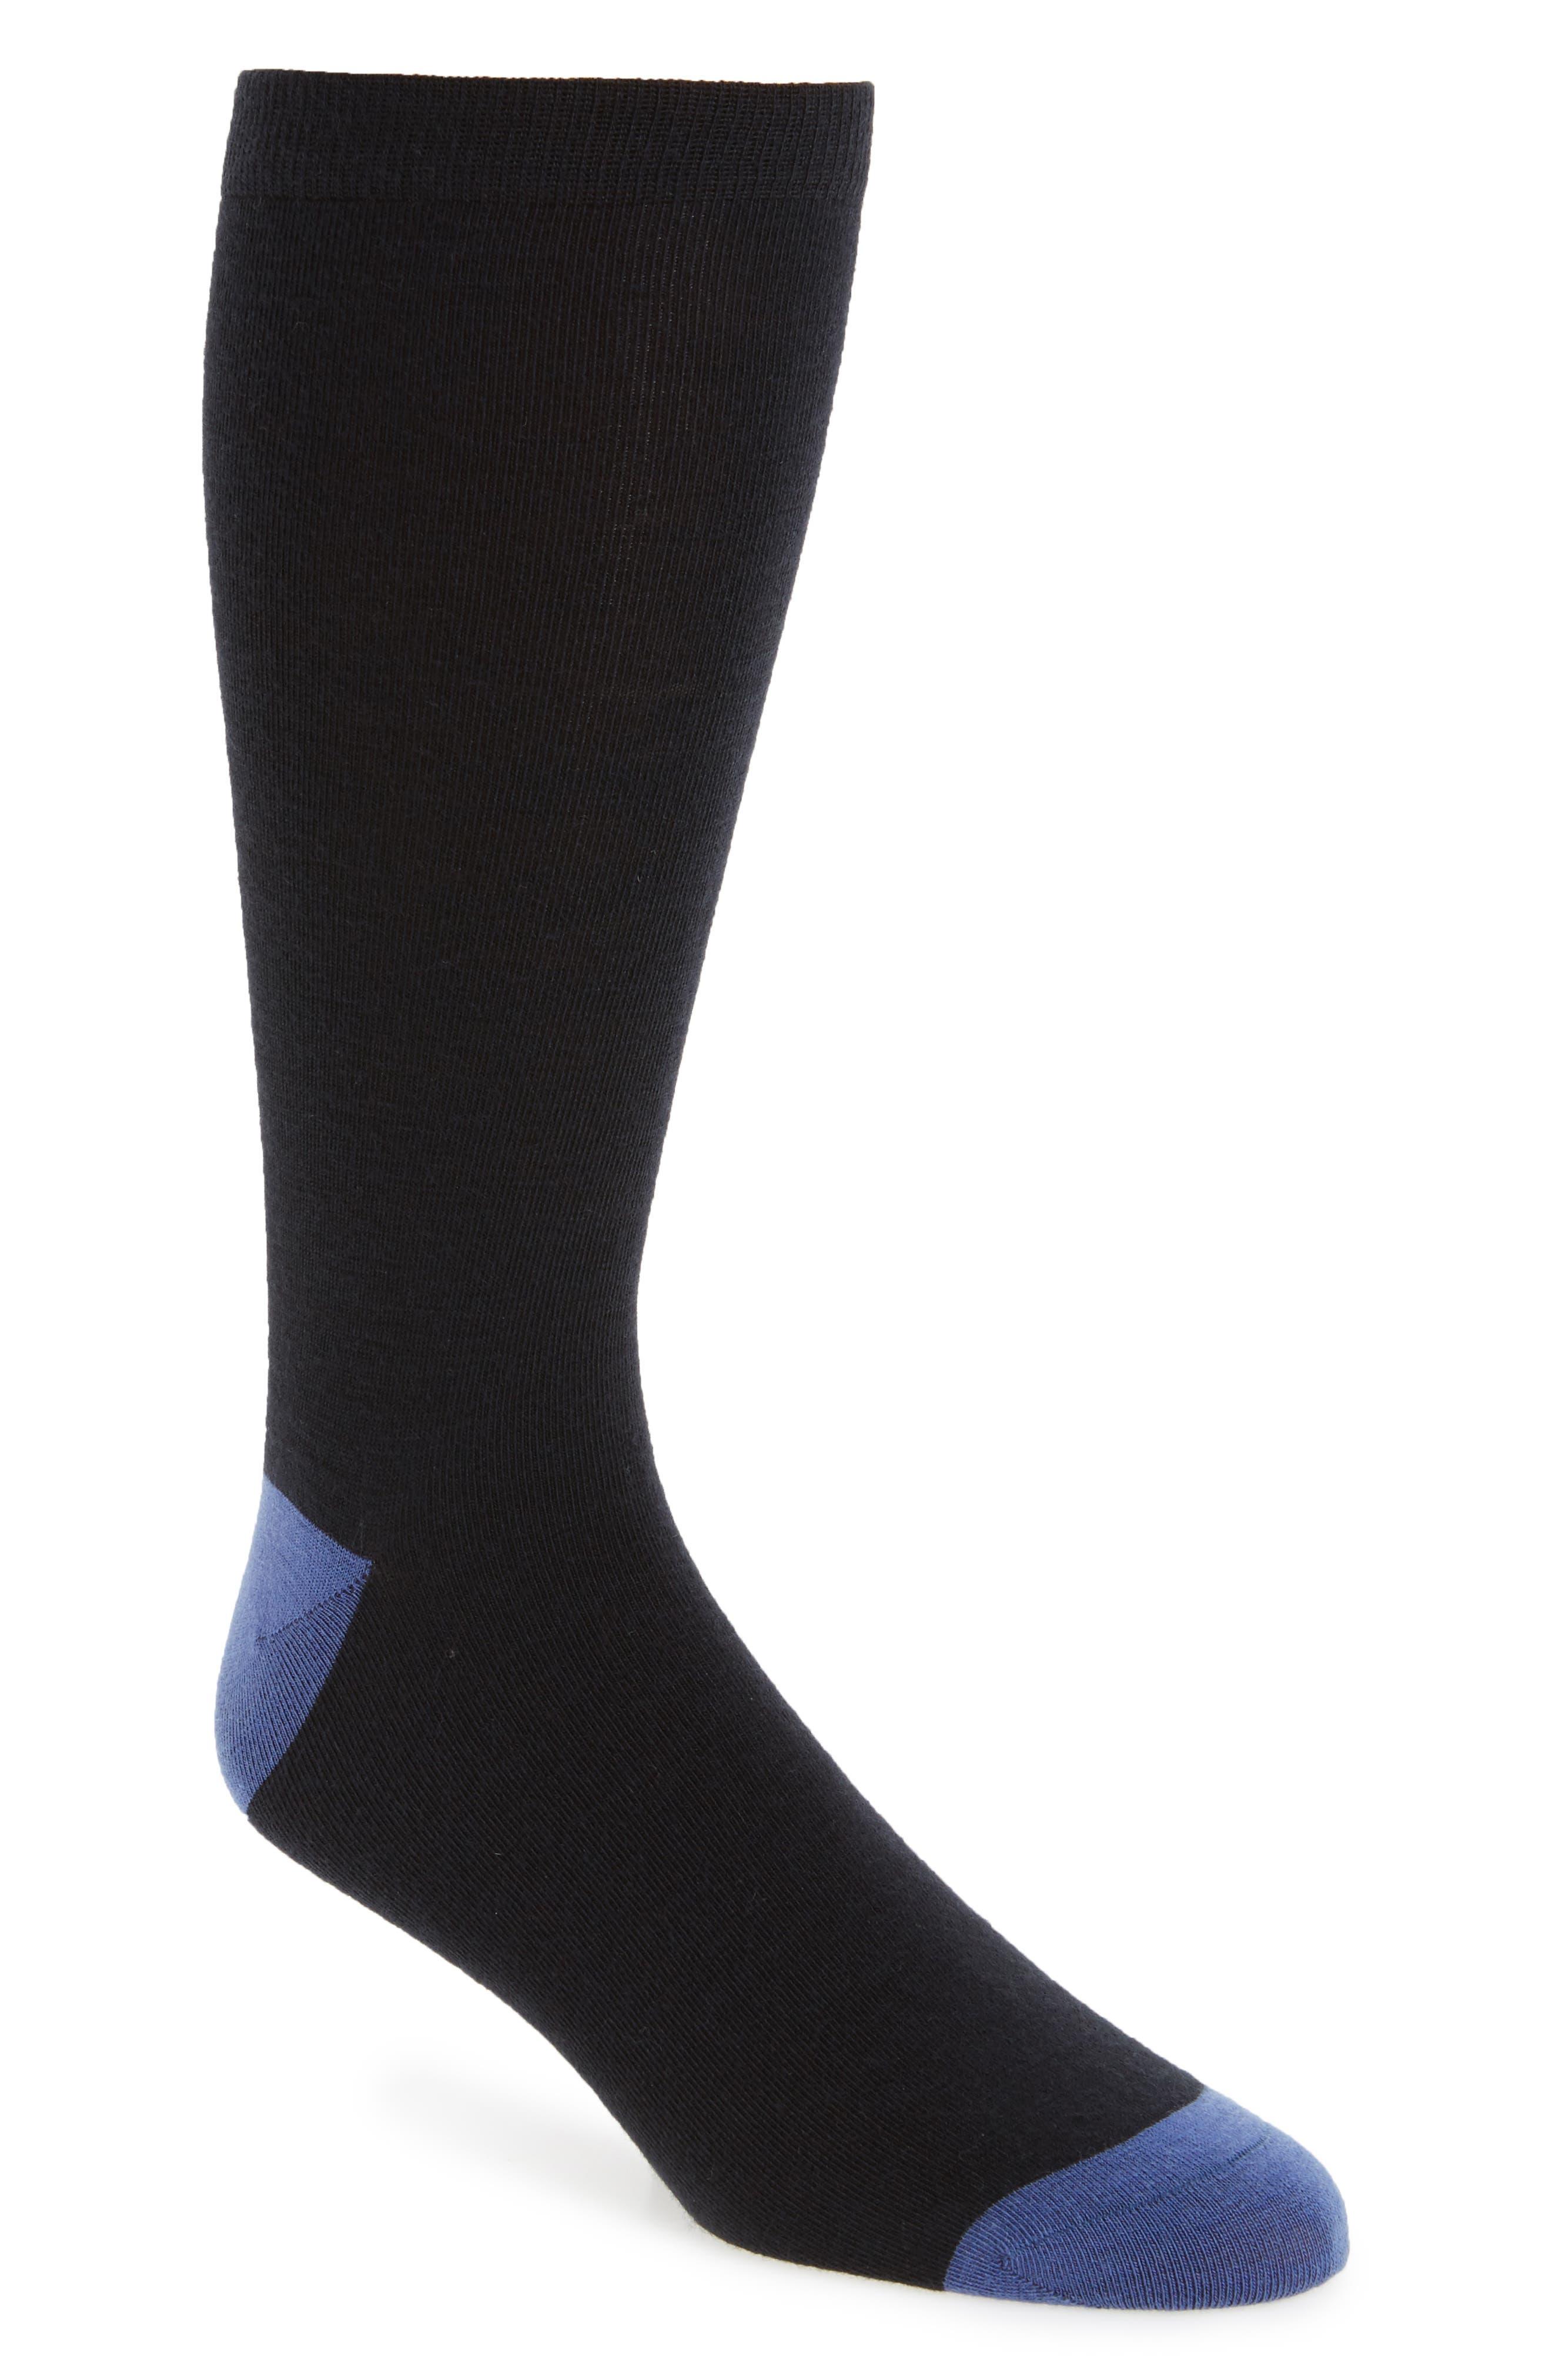 Colorblock Socks,                         Main,                         color,